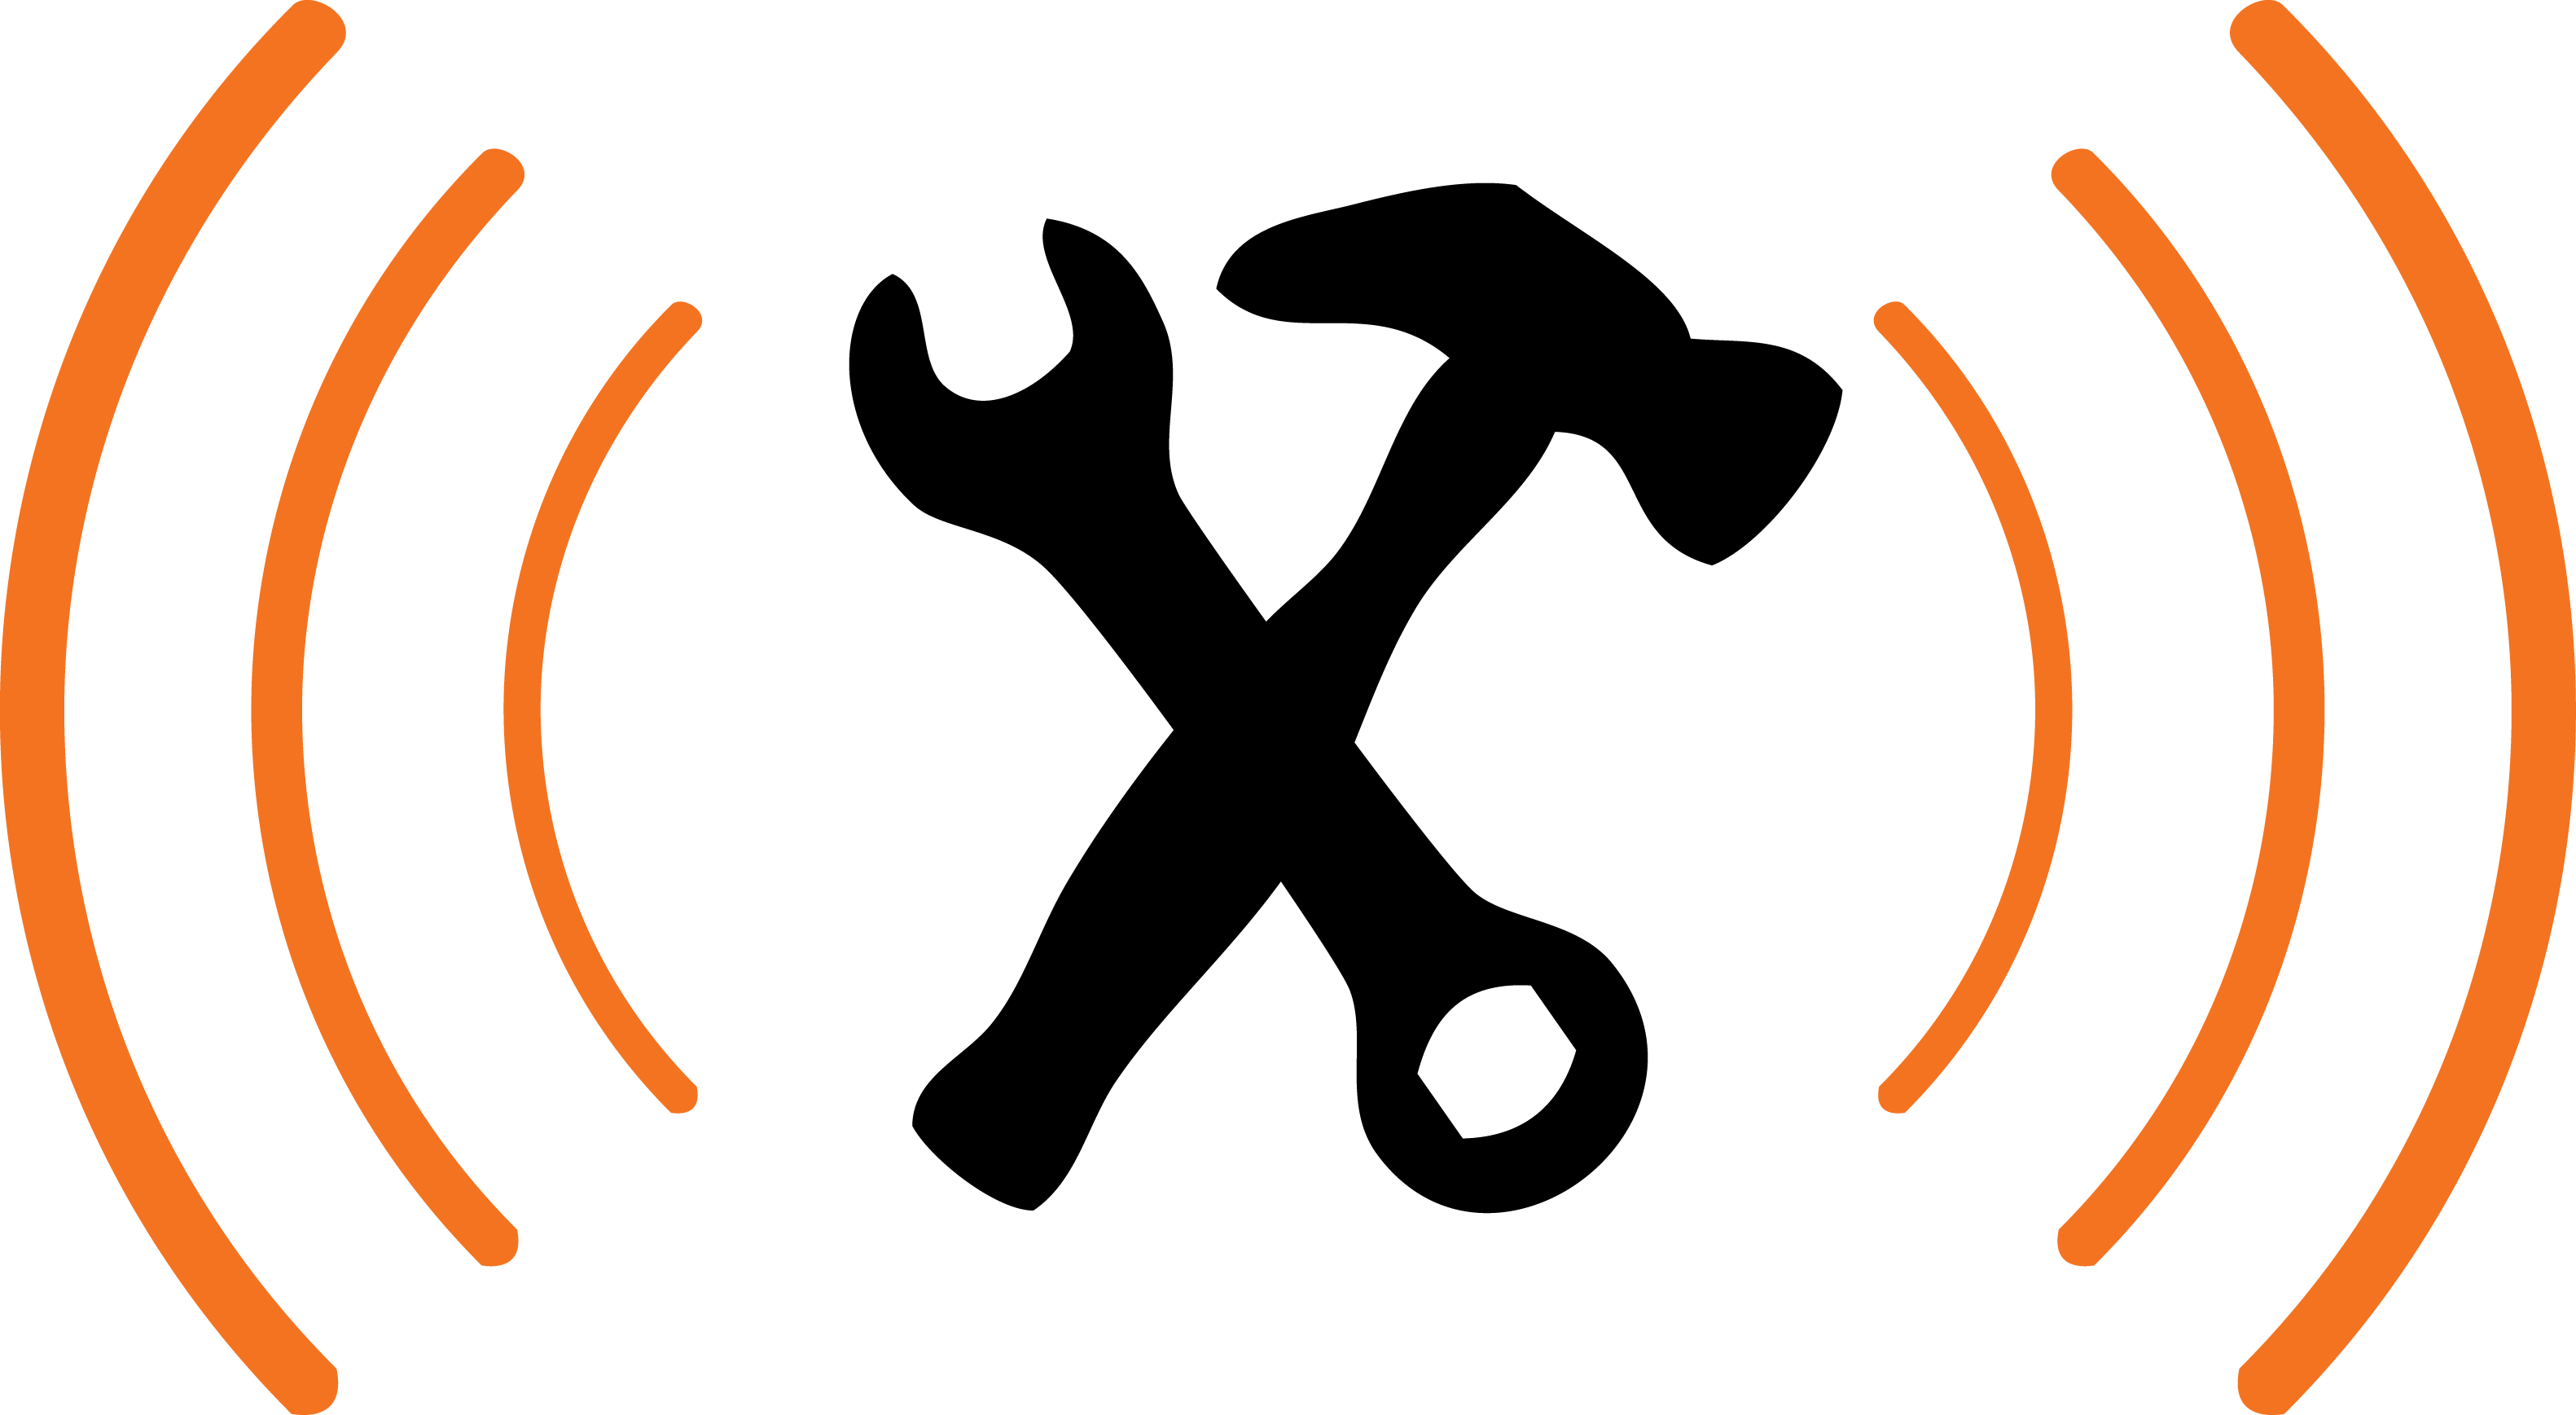 Logo Design Tool Logos design